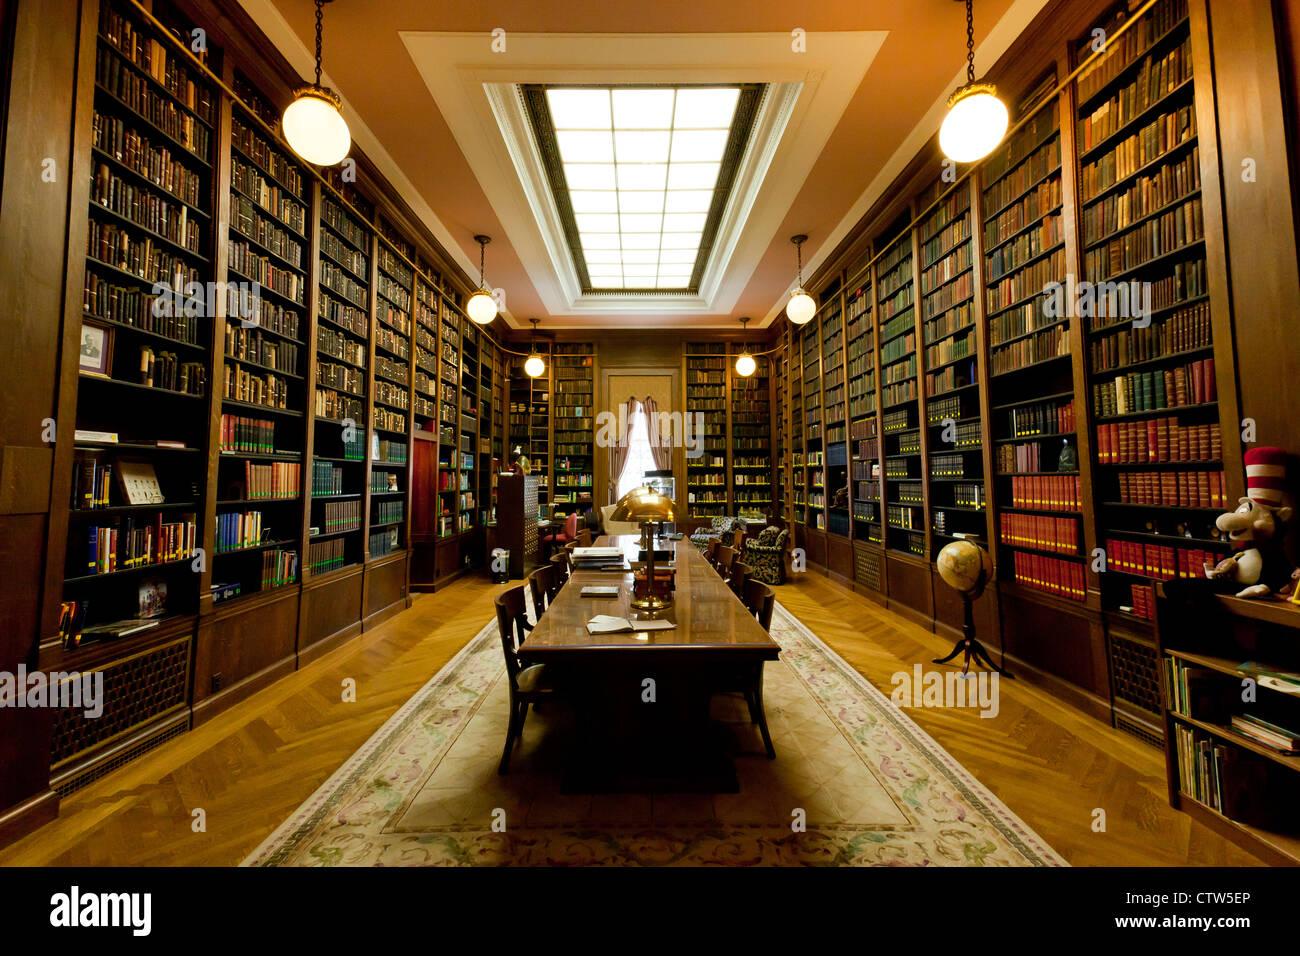 Main library of the Scottish Rite of Freemasonry  Washington , DC - Stock Image